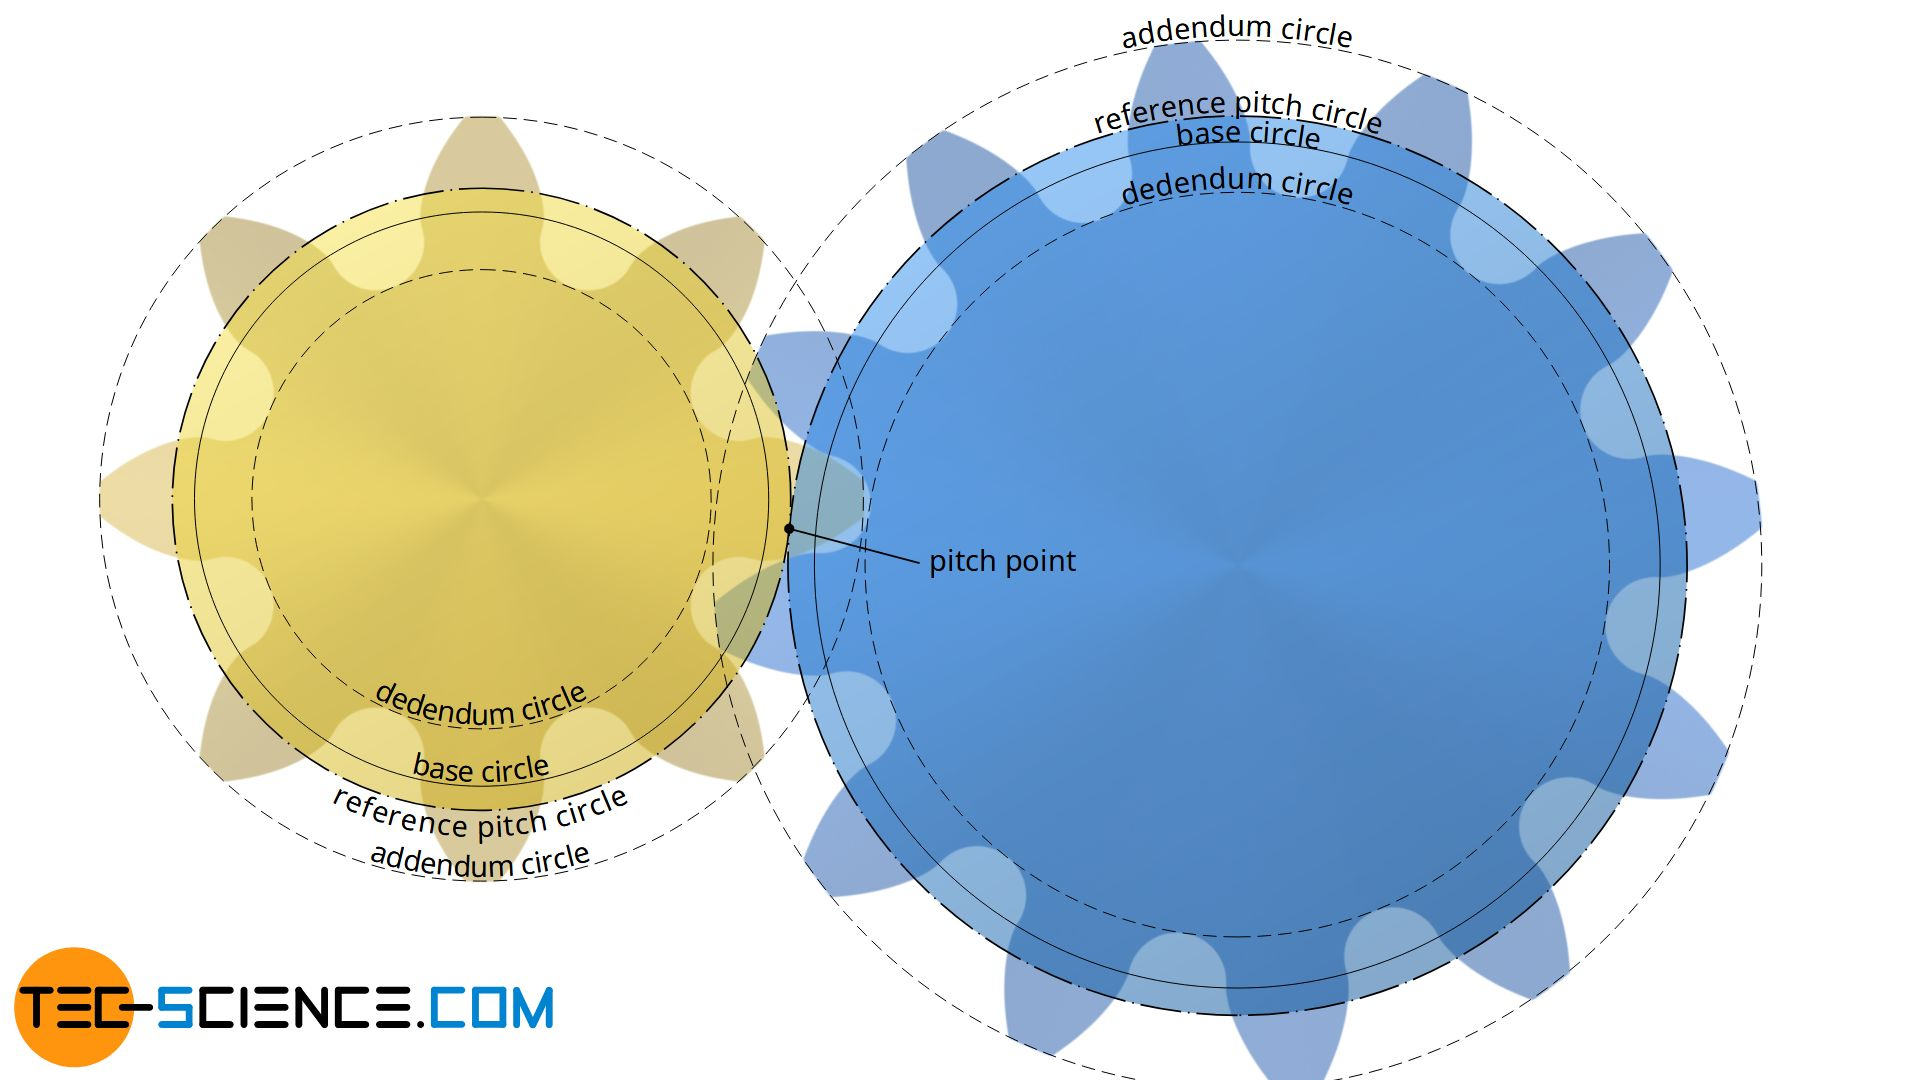 Base circle, addendum circle and dedendum circle of an involute gear